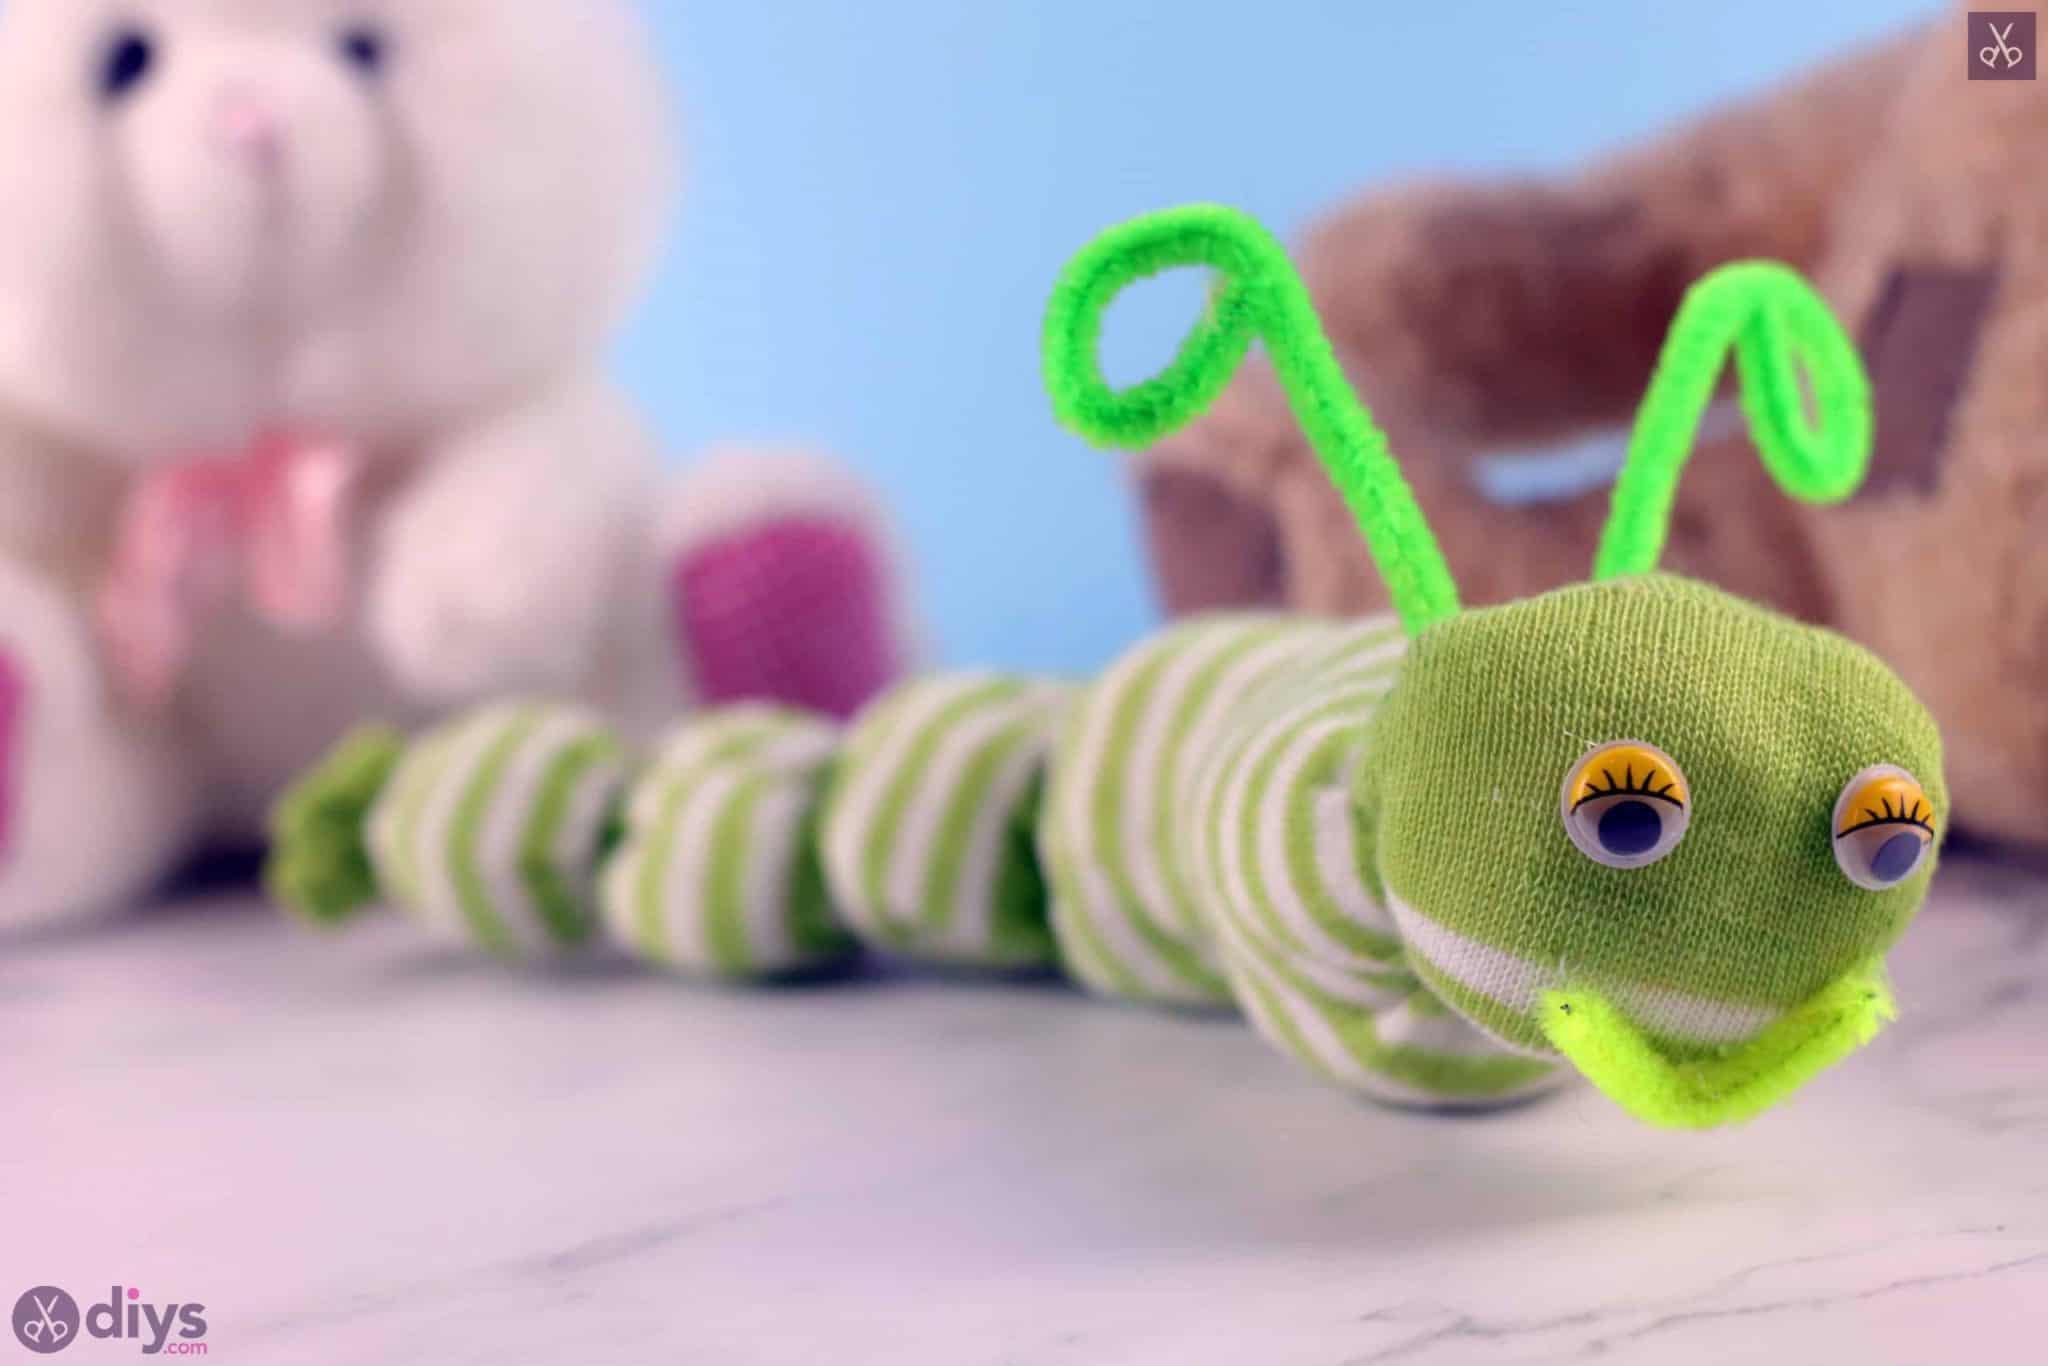 Diy no sew sock worm green